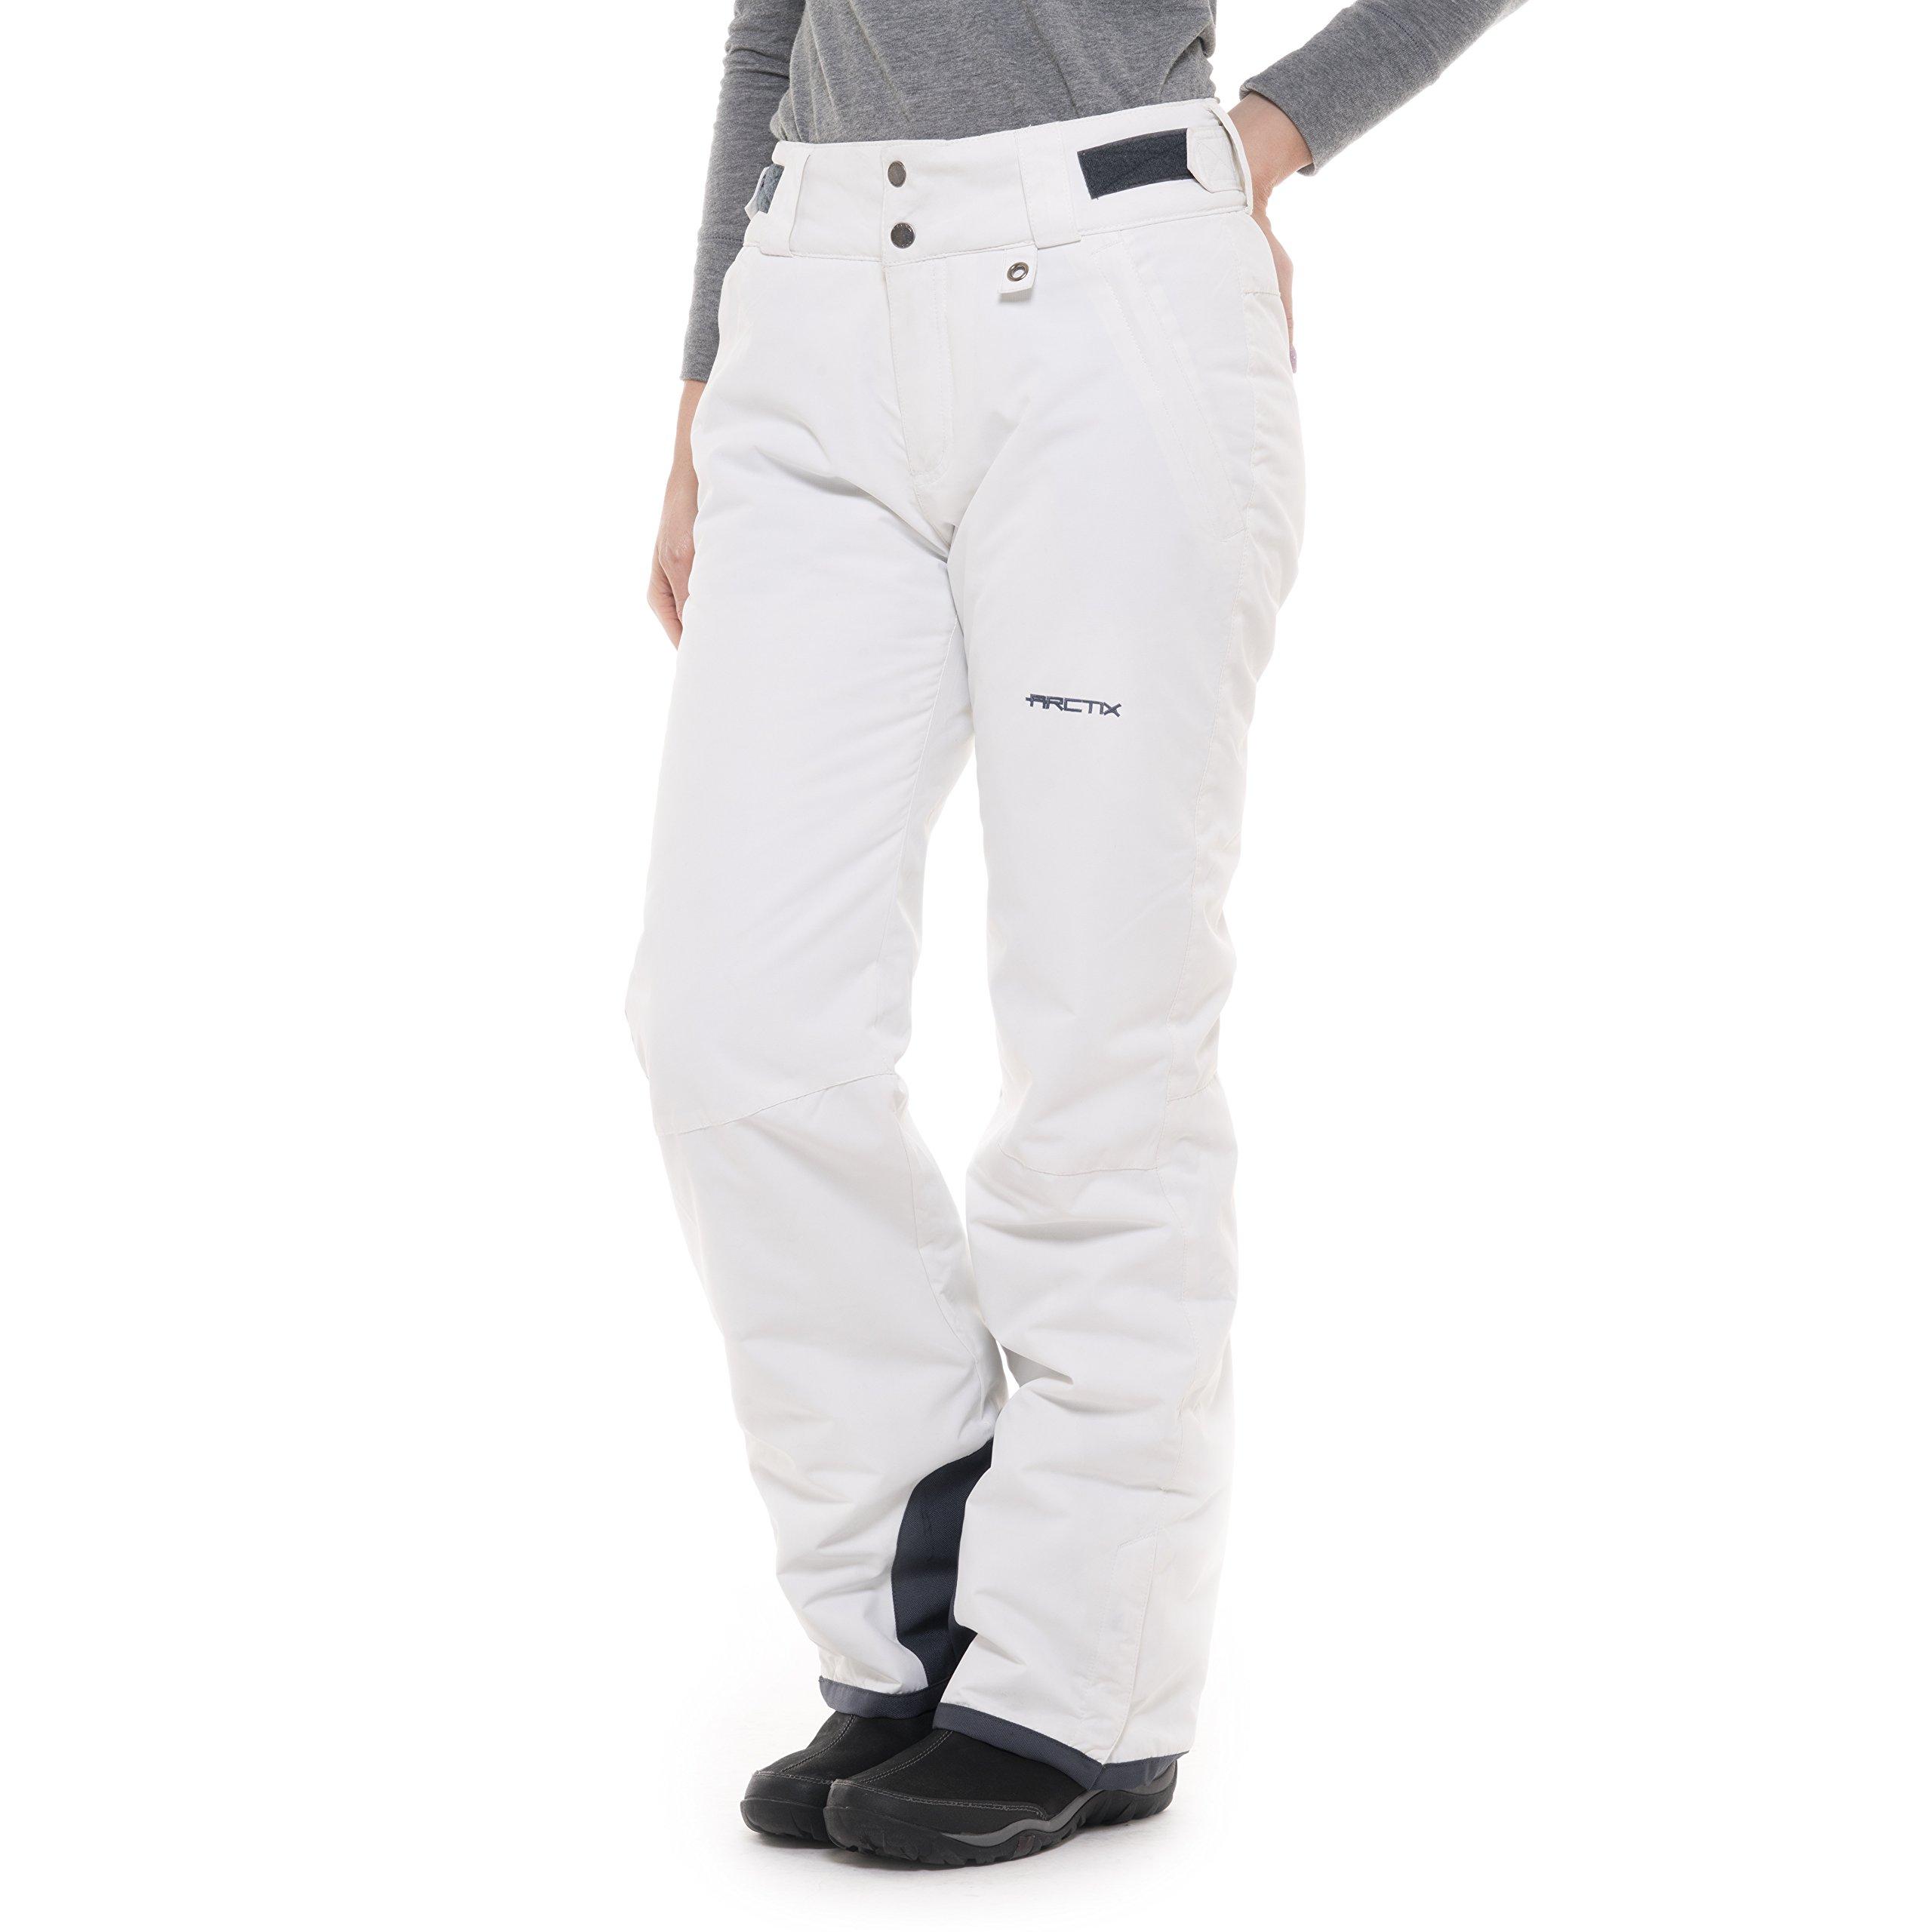 Arctix Women's Insulated Snow Pant, White, Small/Regular